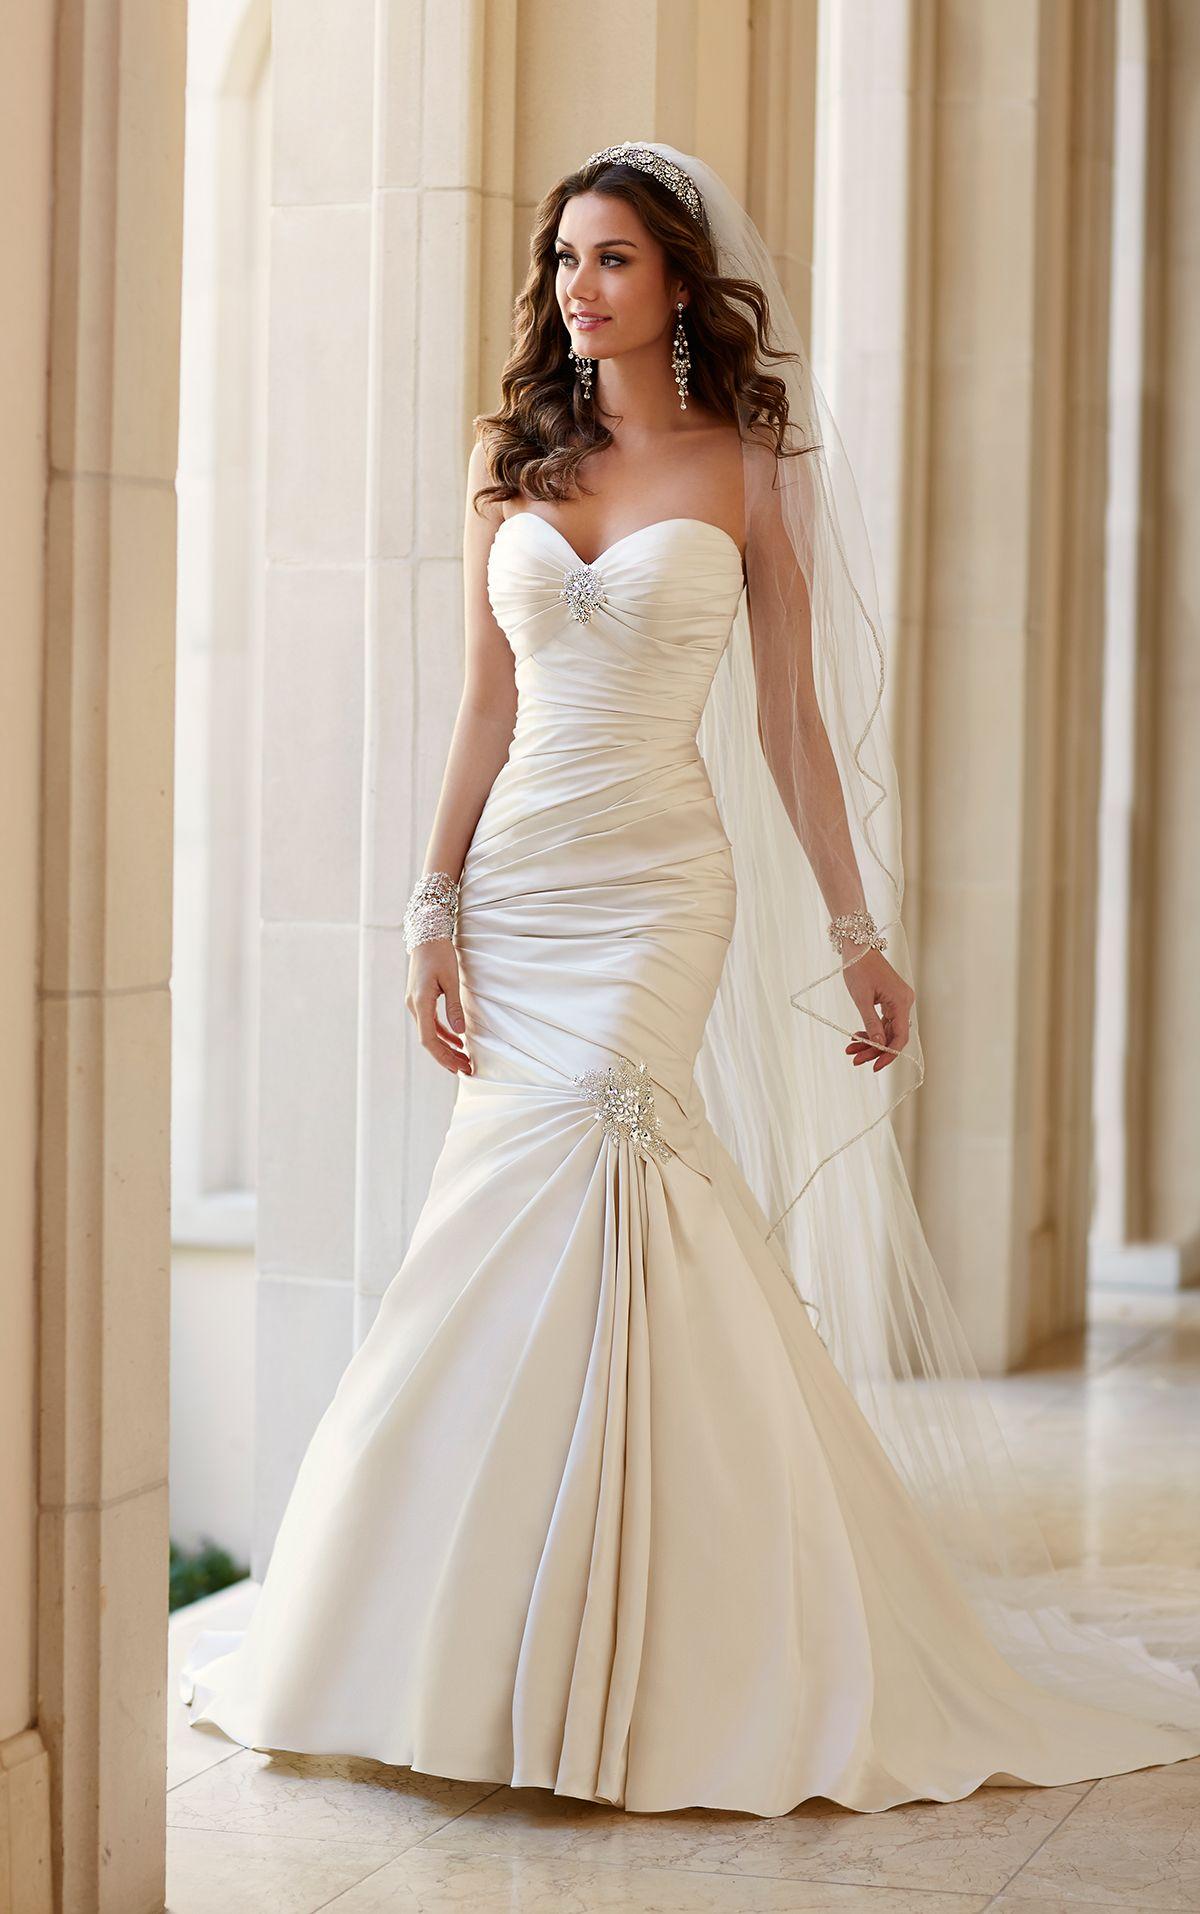 Extravagant Stella York Wedding Dresses | Pinterest | Brautmode ...